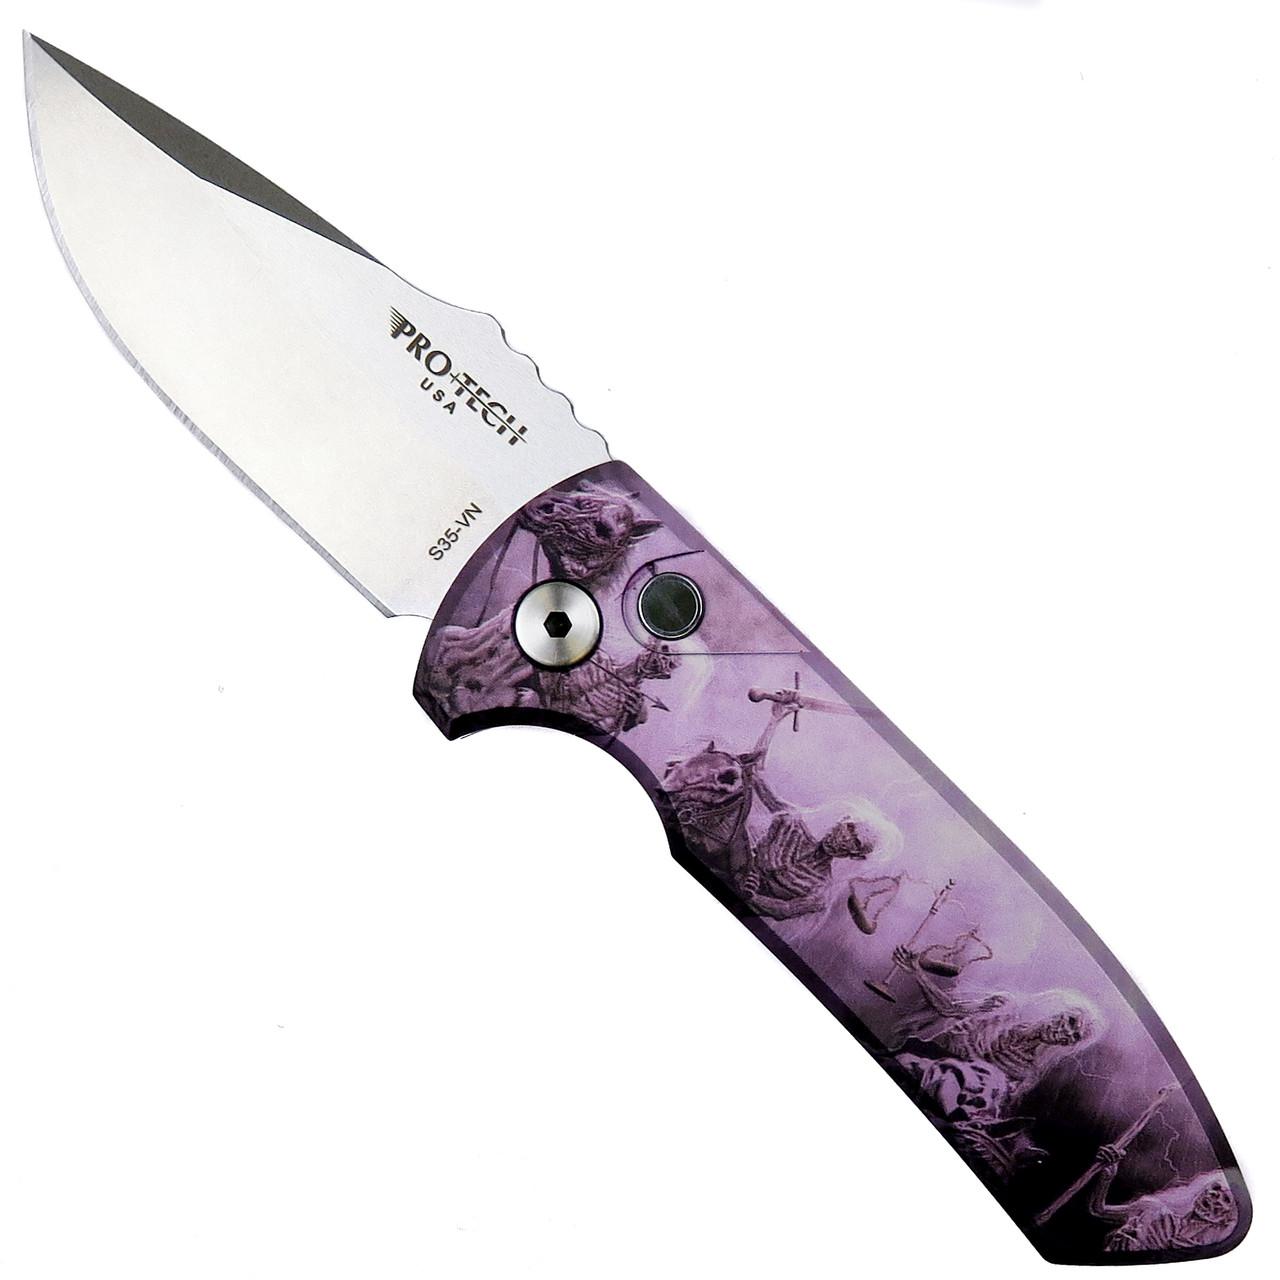 Pro-Tech Skulls #1 SBR Auto Knife, Stonewash Blade